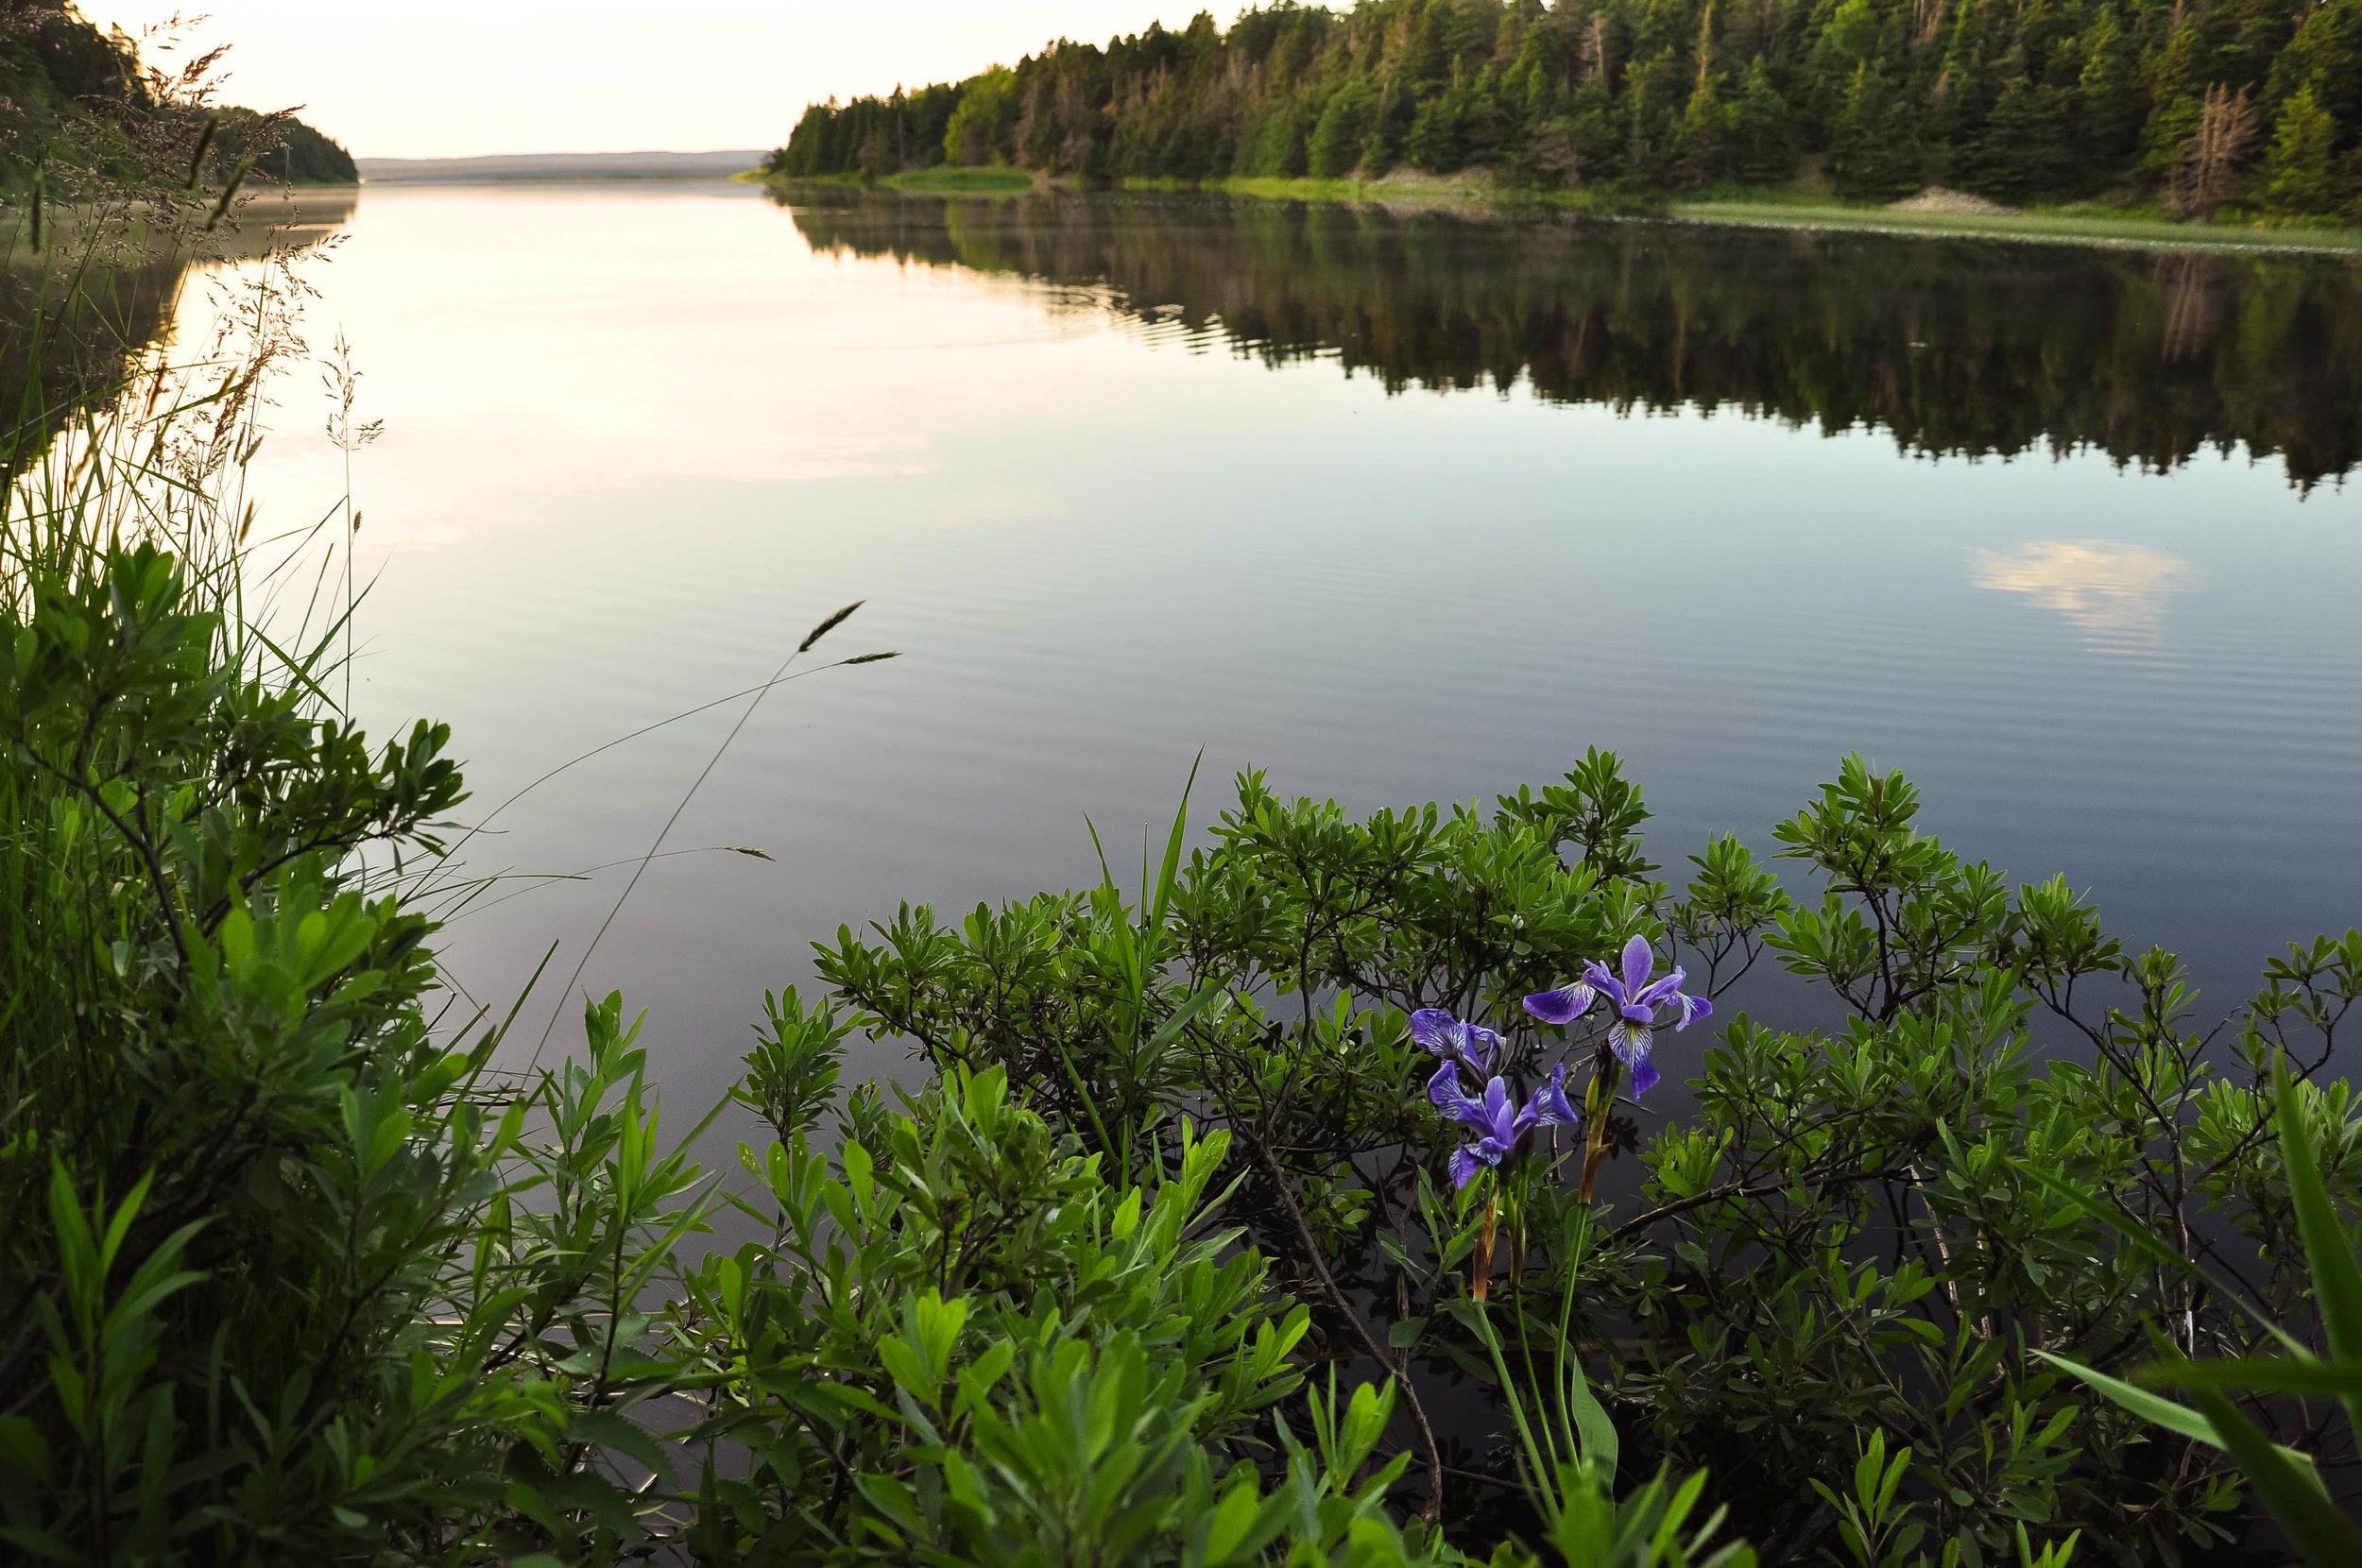 Environmental monitoring St. John's Newfoundland, Industrial environmental work